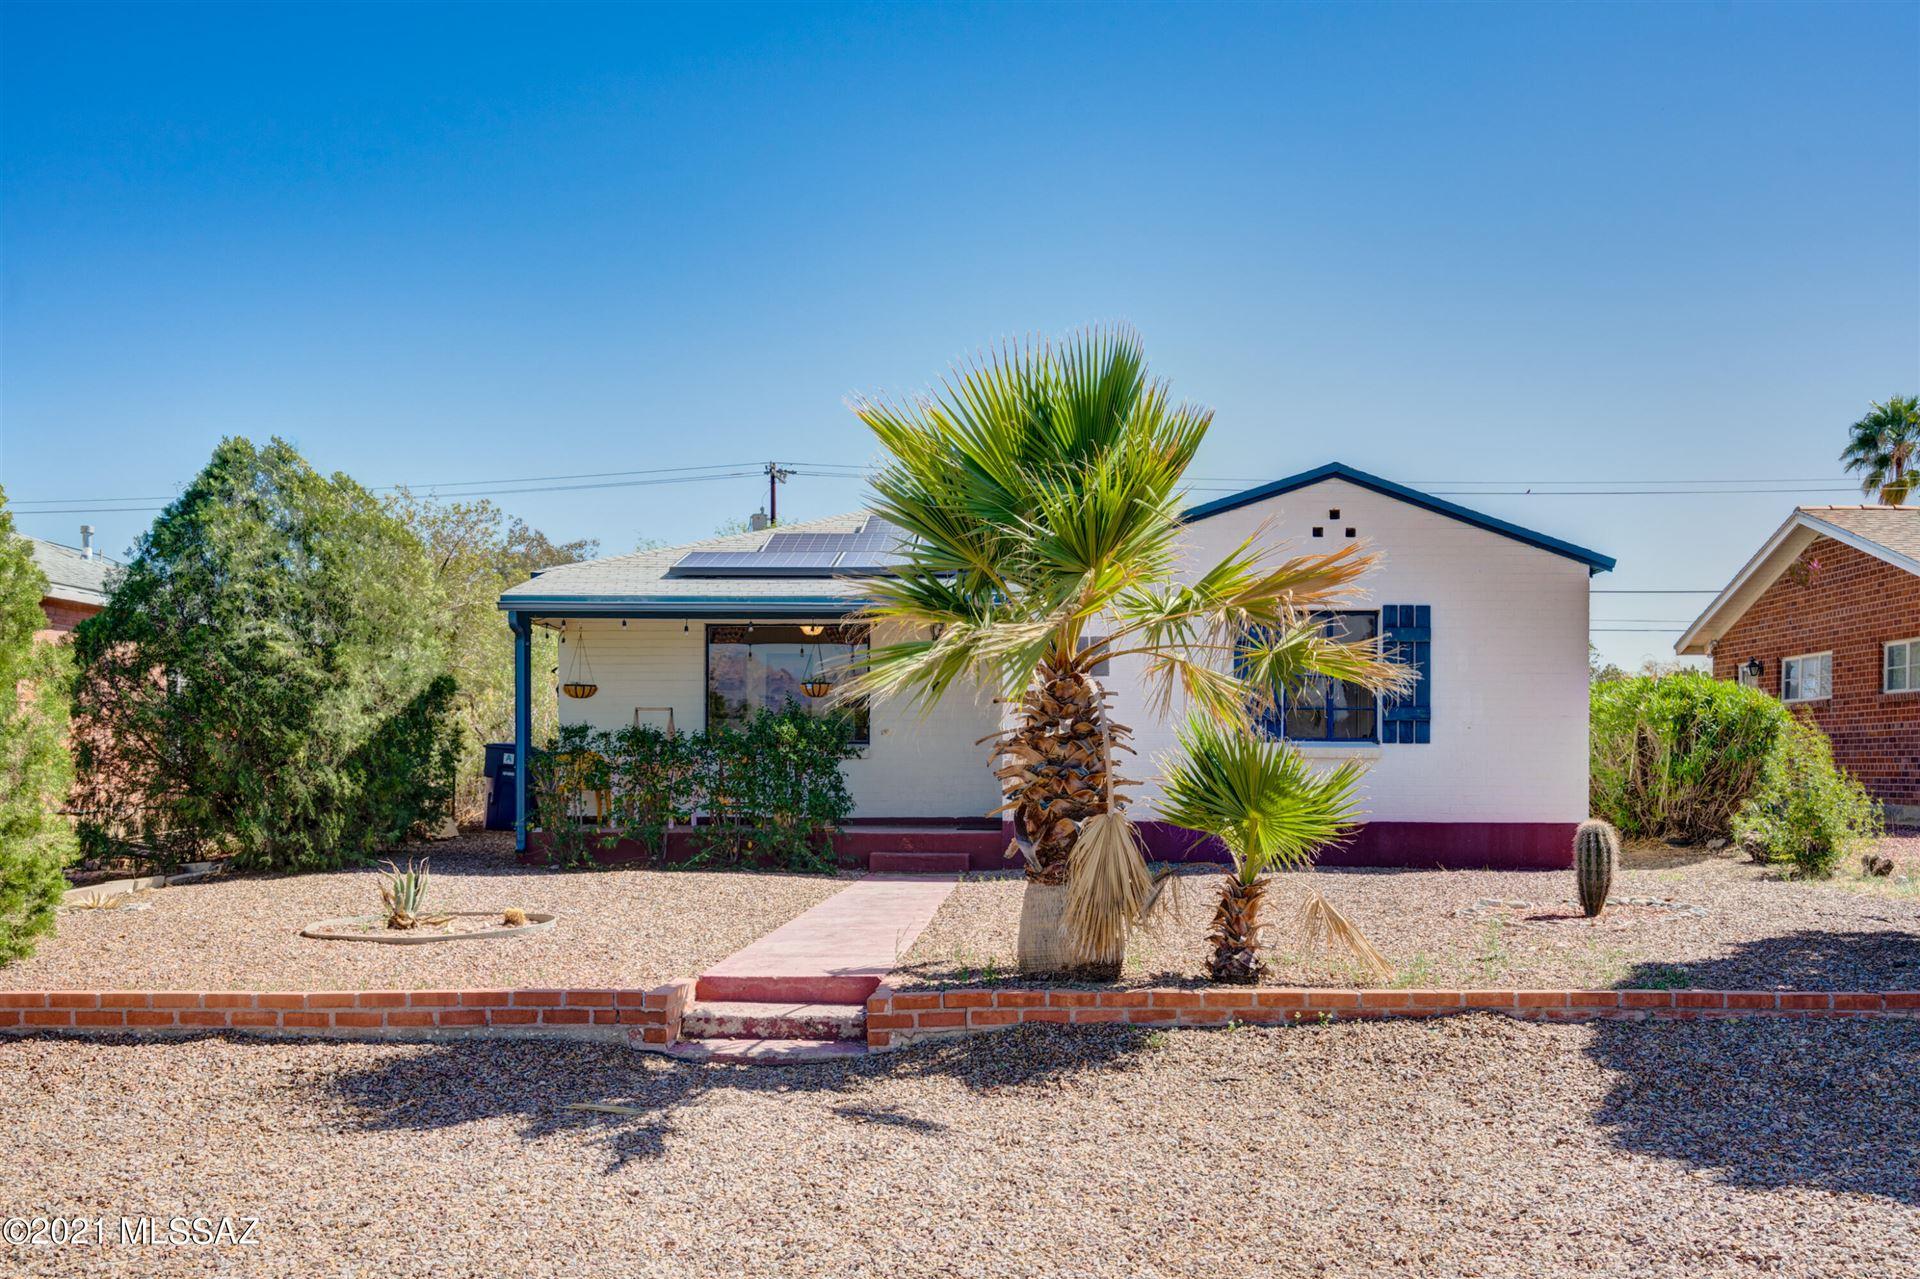 1516 E Water Street, Tucson, AZ 85719 - MLS#: 22109189